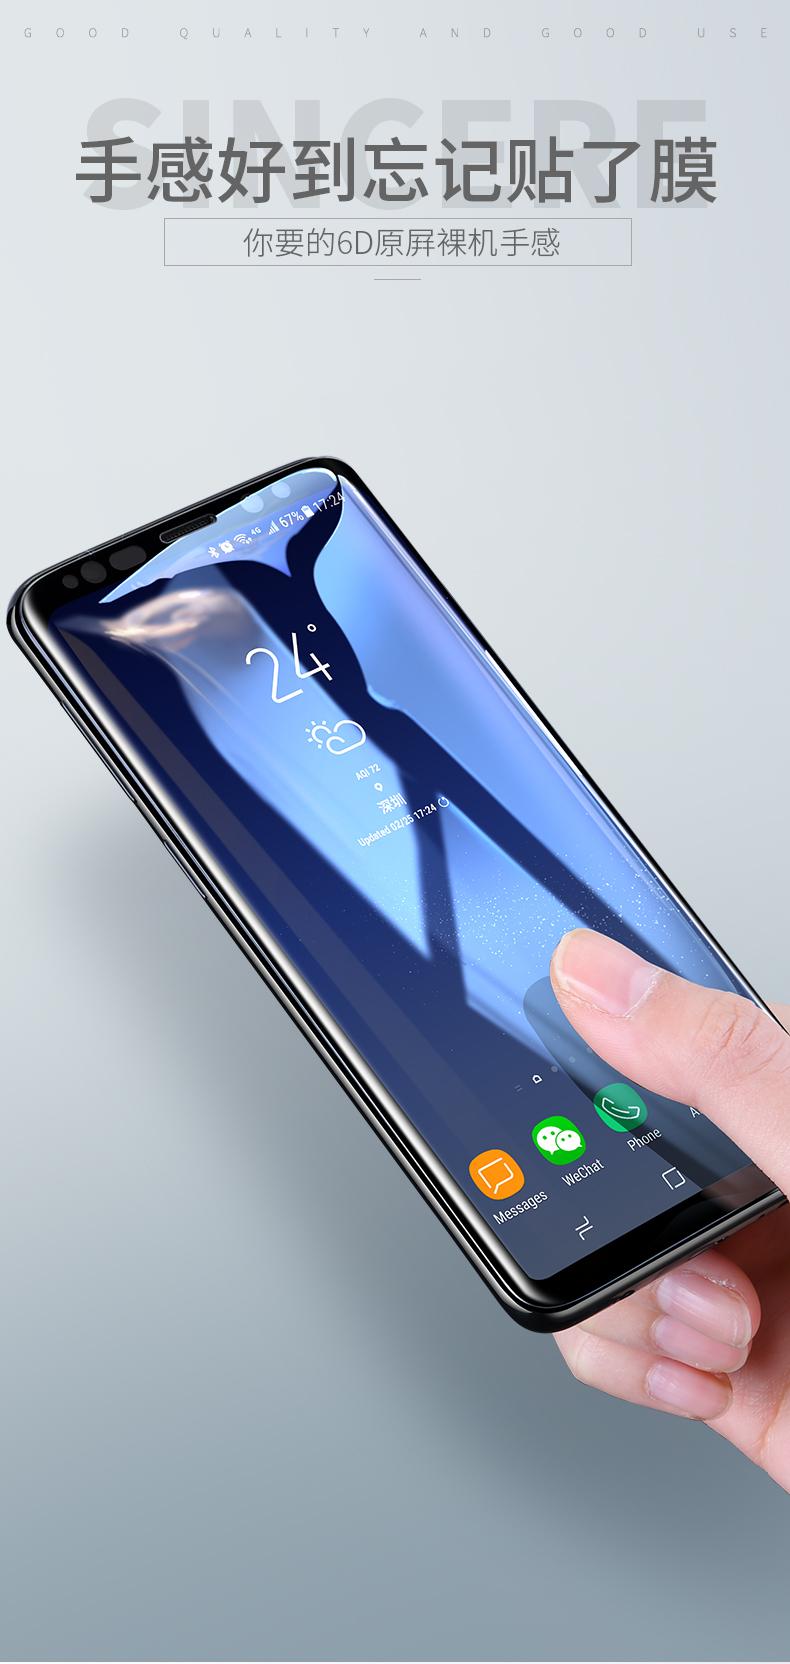 Samsung Galaxy S9S9 phone screen end 4212019 1245 PM